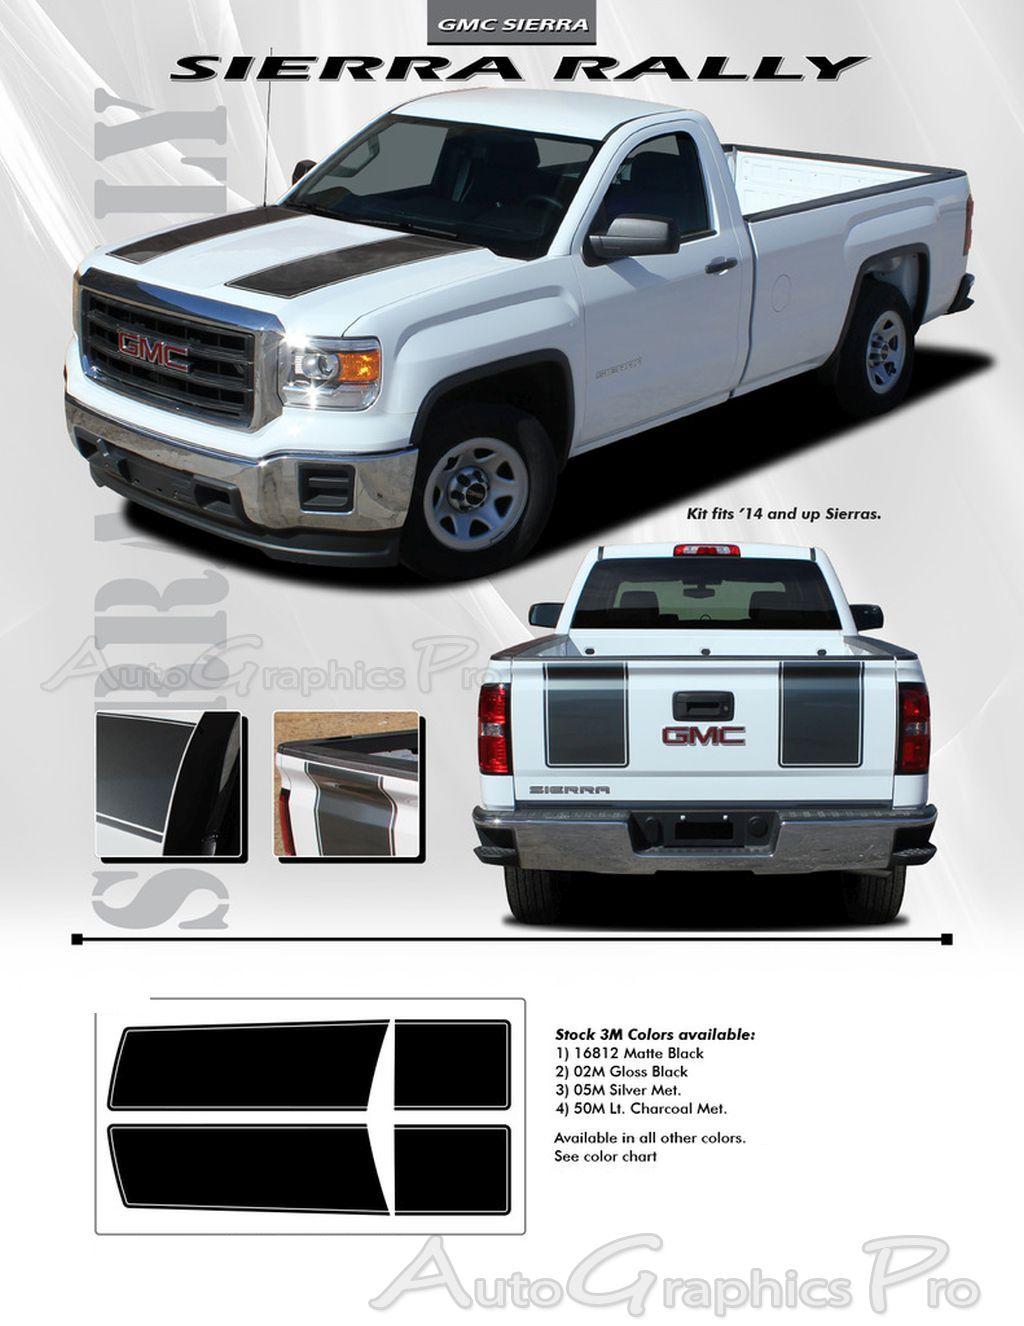 GMC Sierra SIERRA RALLY Edition Style Truck Hood - Chevy decals for trucksmore decalchevrolet silverado rally edition unveiled